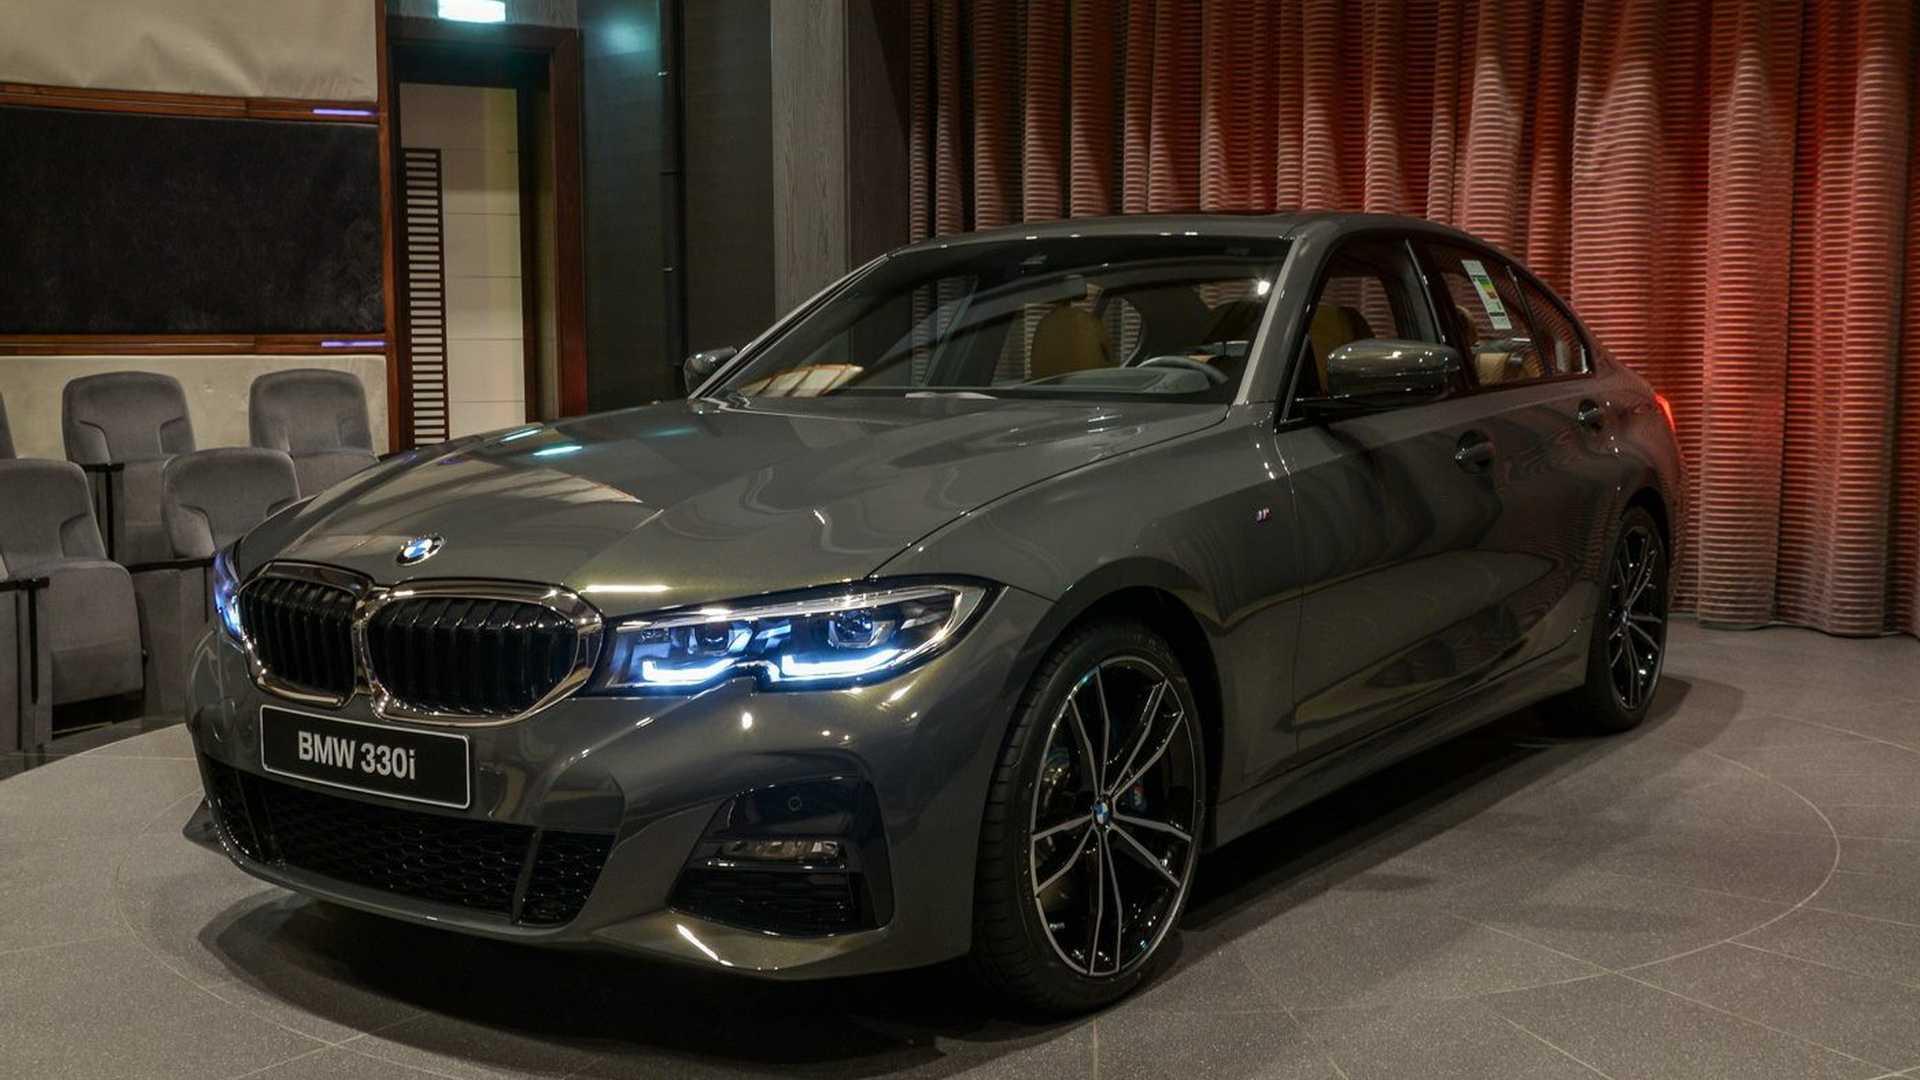 Formacar Bmw Abu Dhabi Motors Offers A Bmw 330i Dravit Gray Metallic